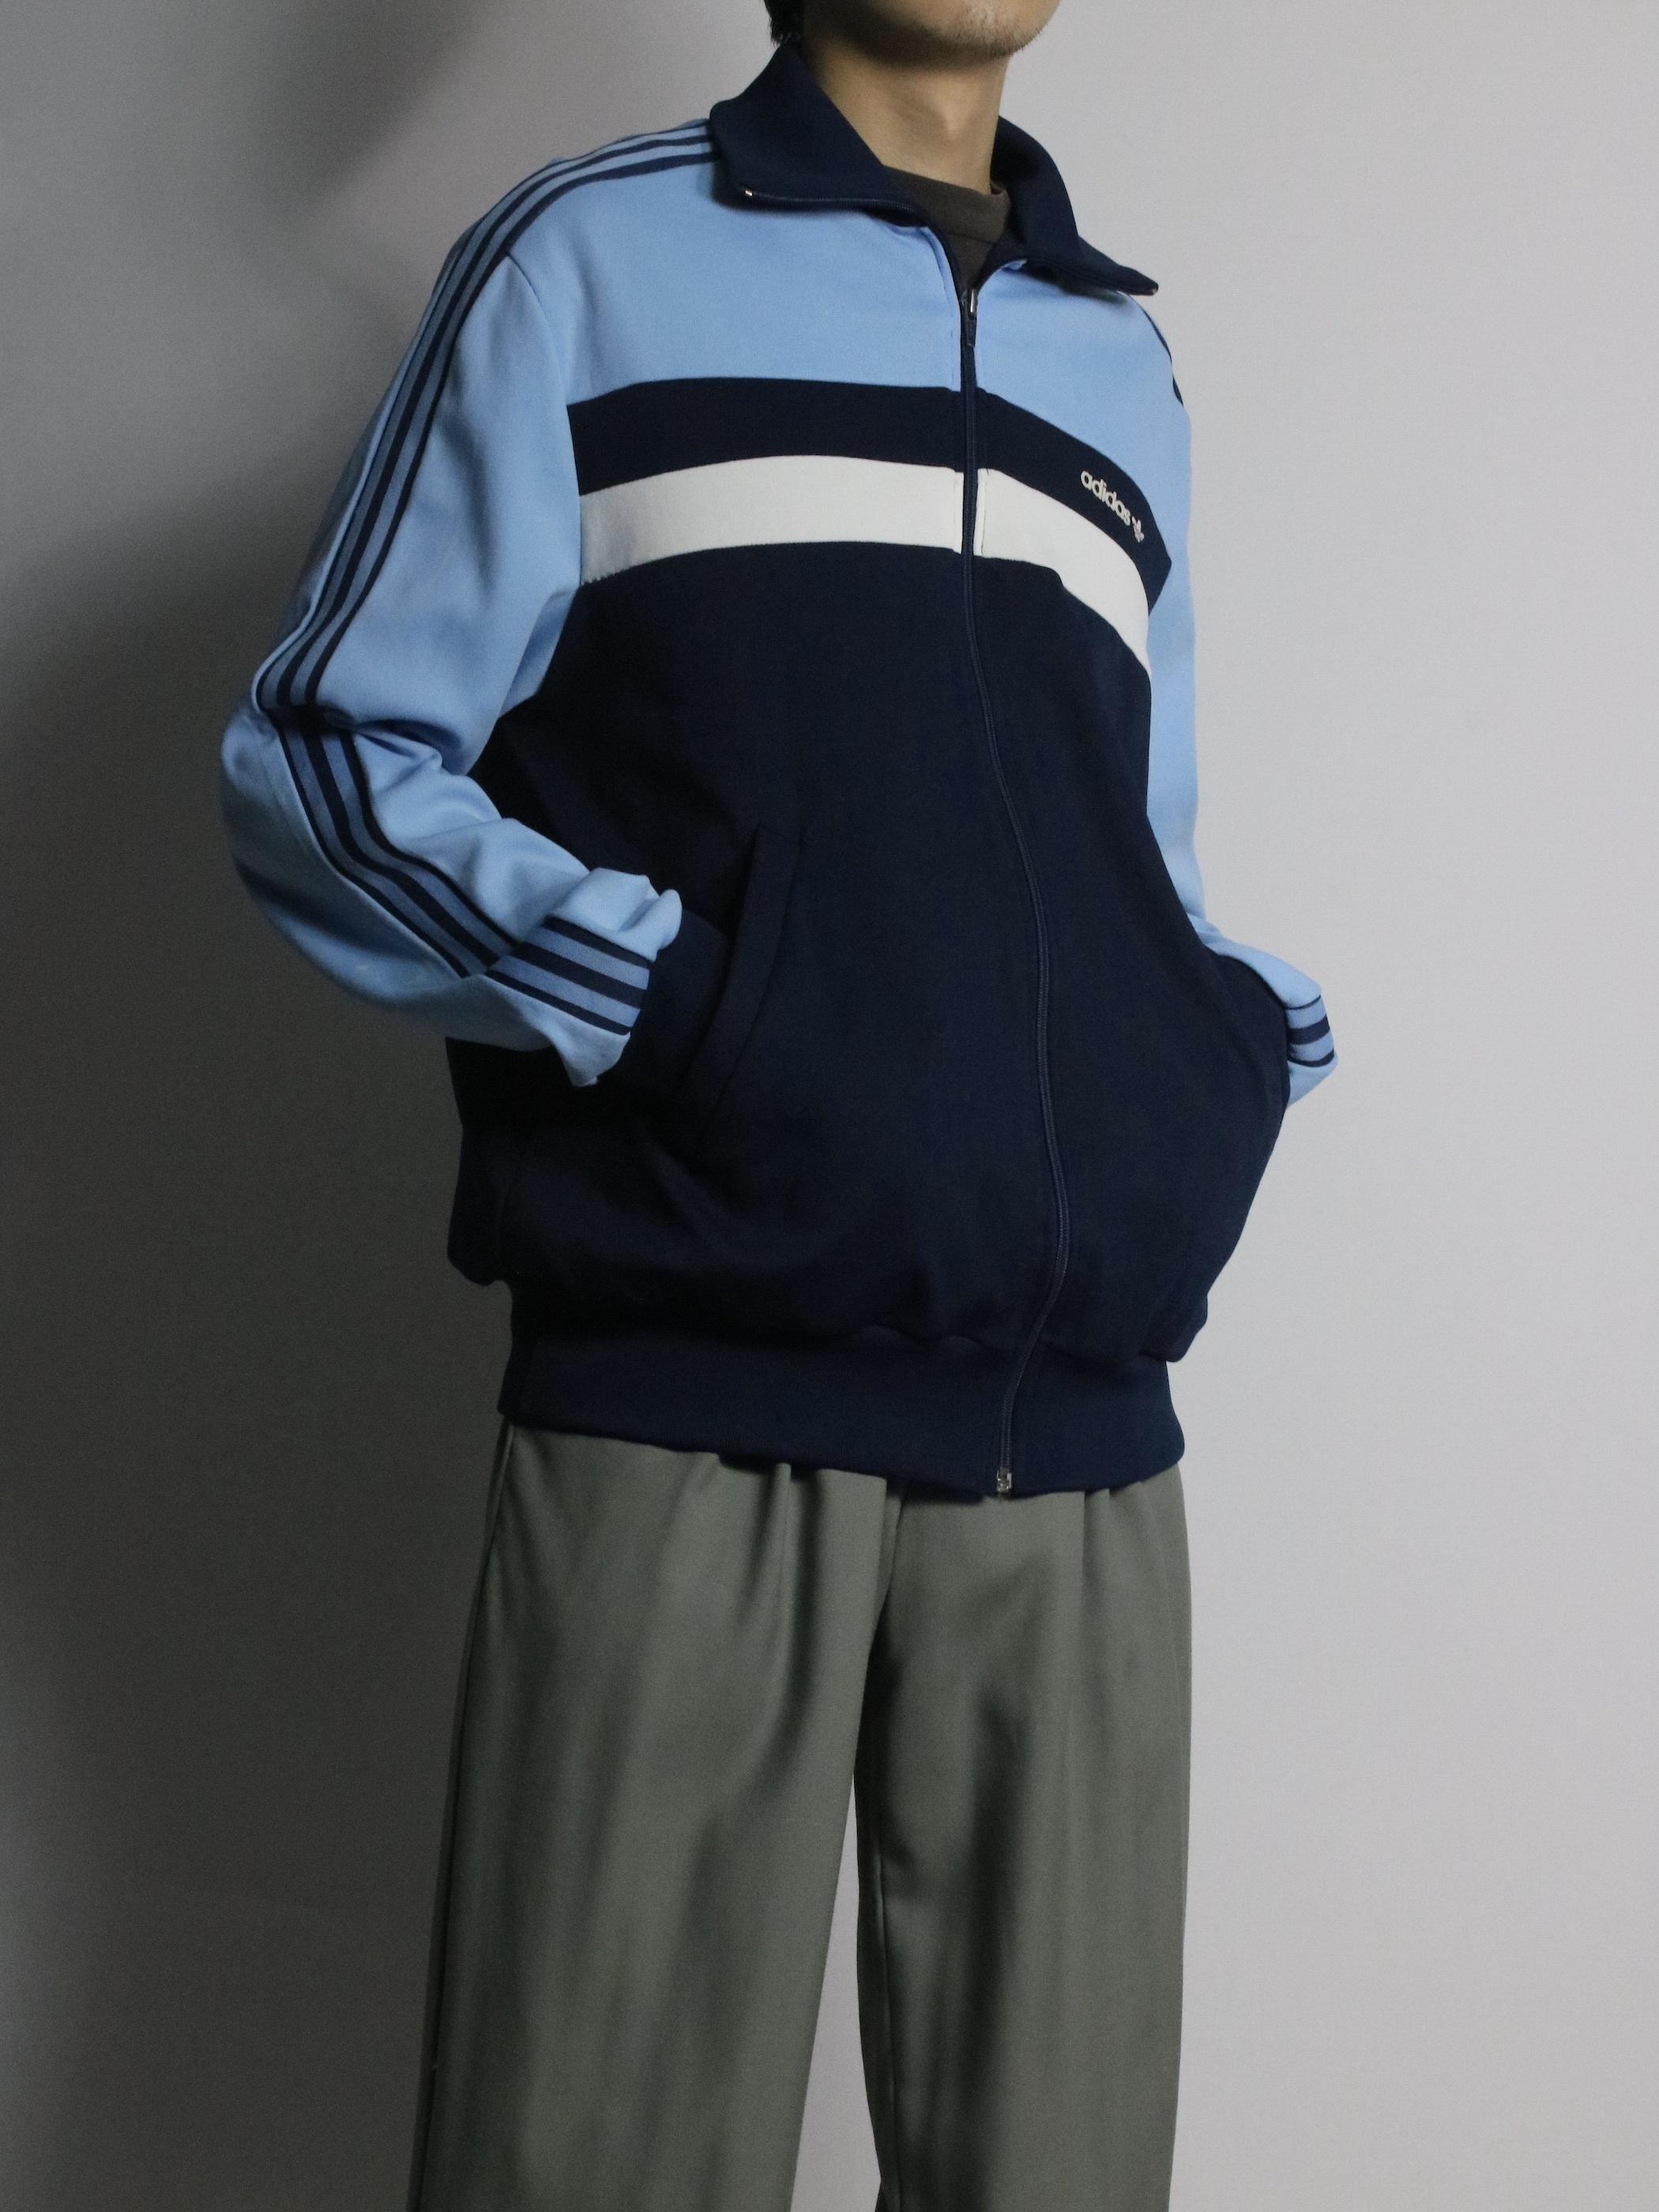 1980's adidas Track jacket / Made in Tunisia